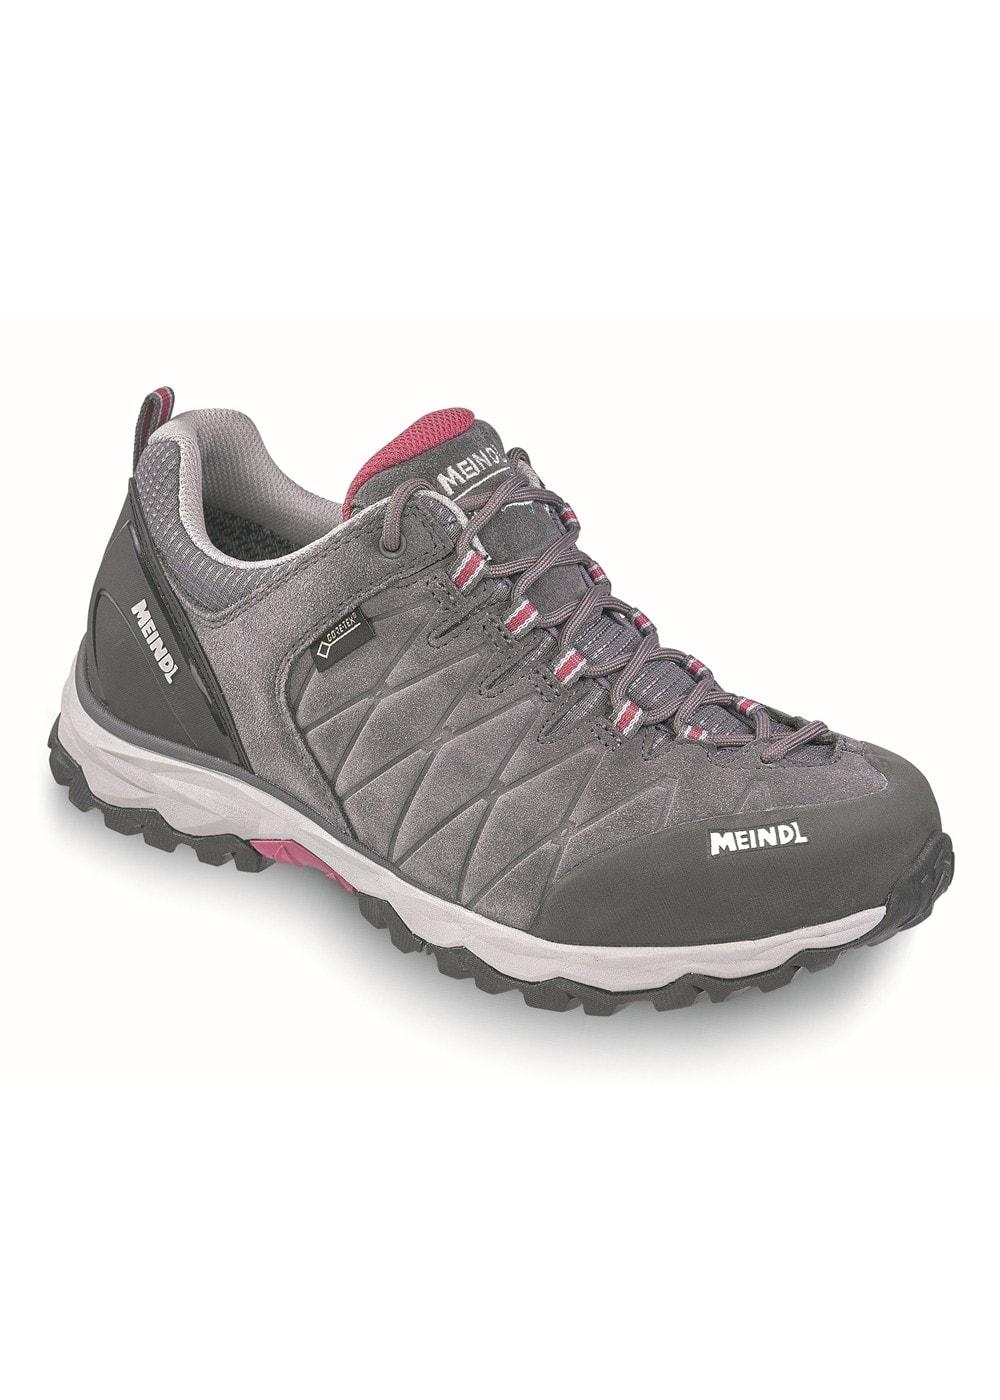 Meindl Mondello Lady GTX Shoes - Ladies